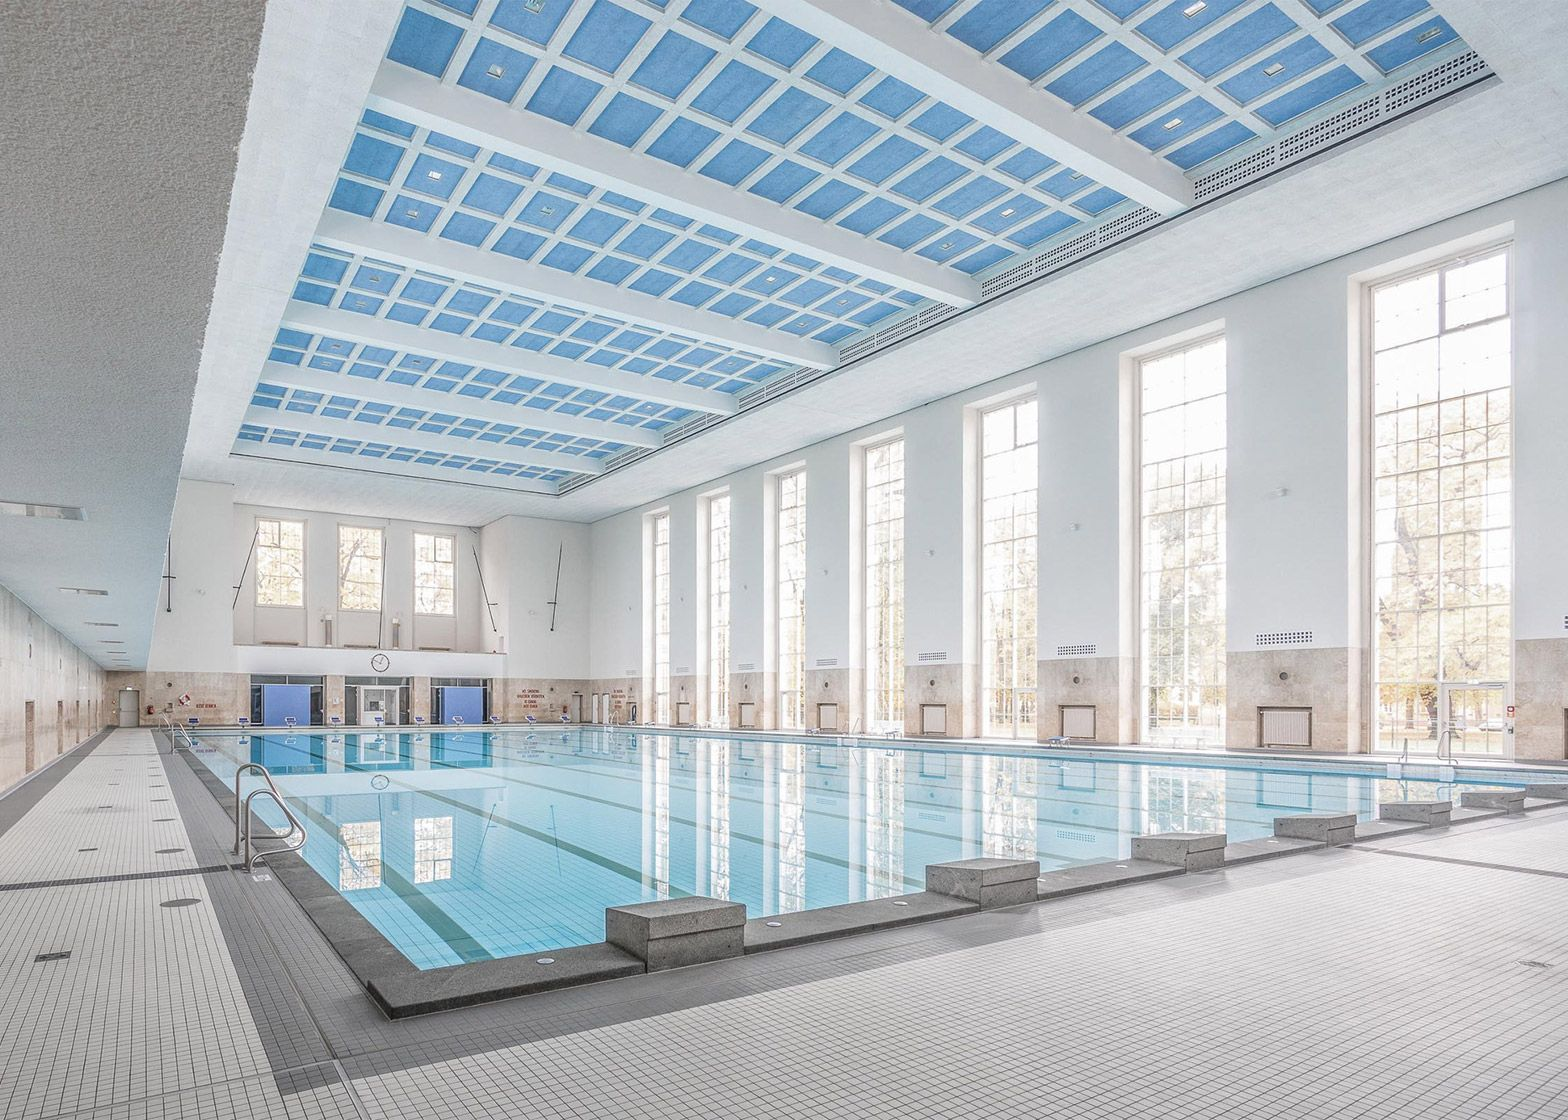 Veauthier Meyer Architects renovates Nazi-era swimming pool